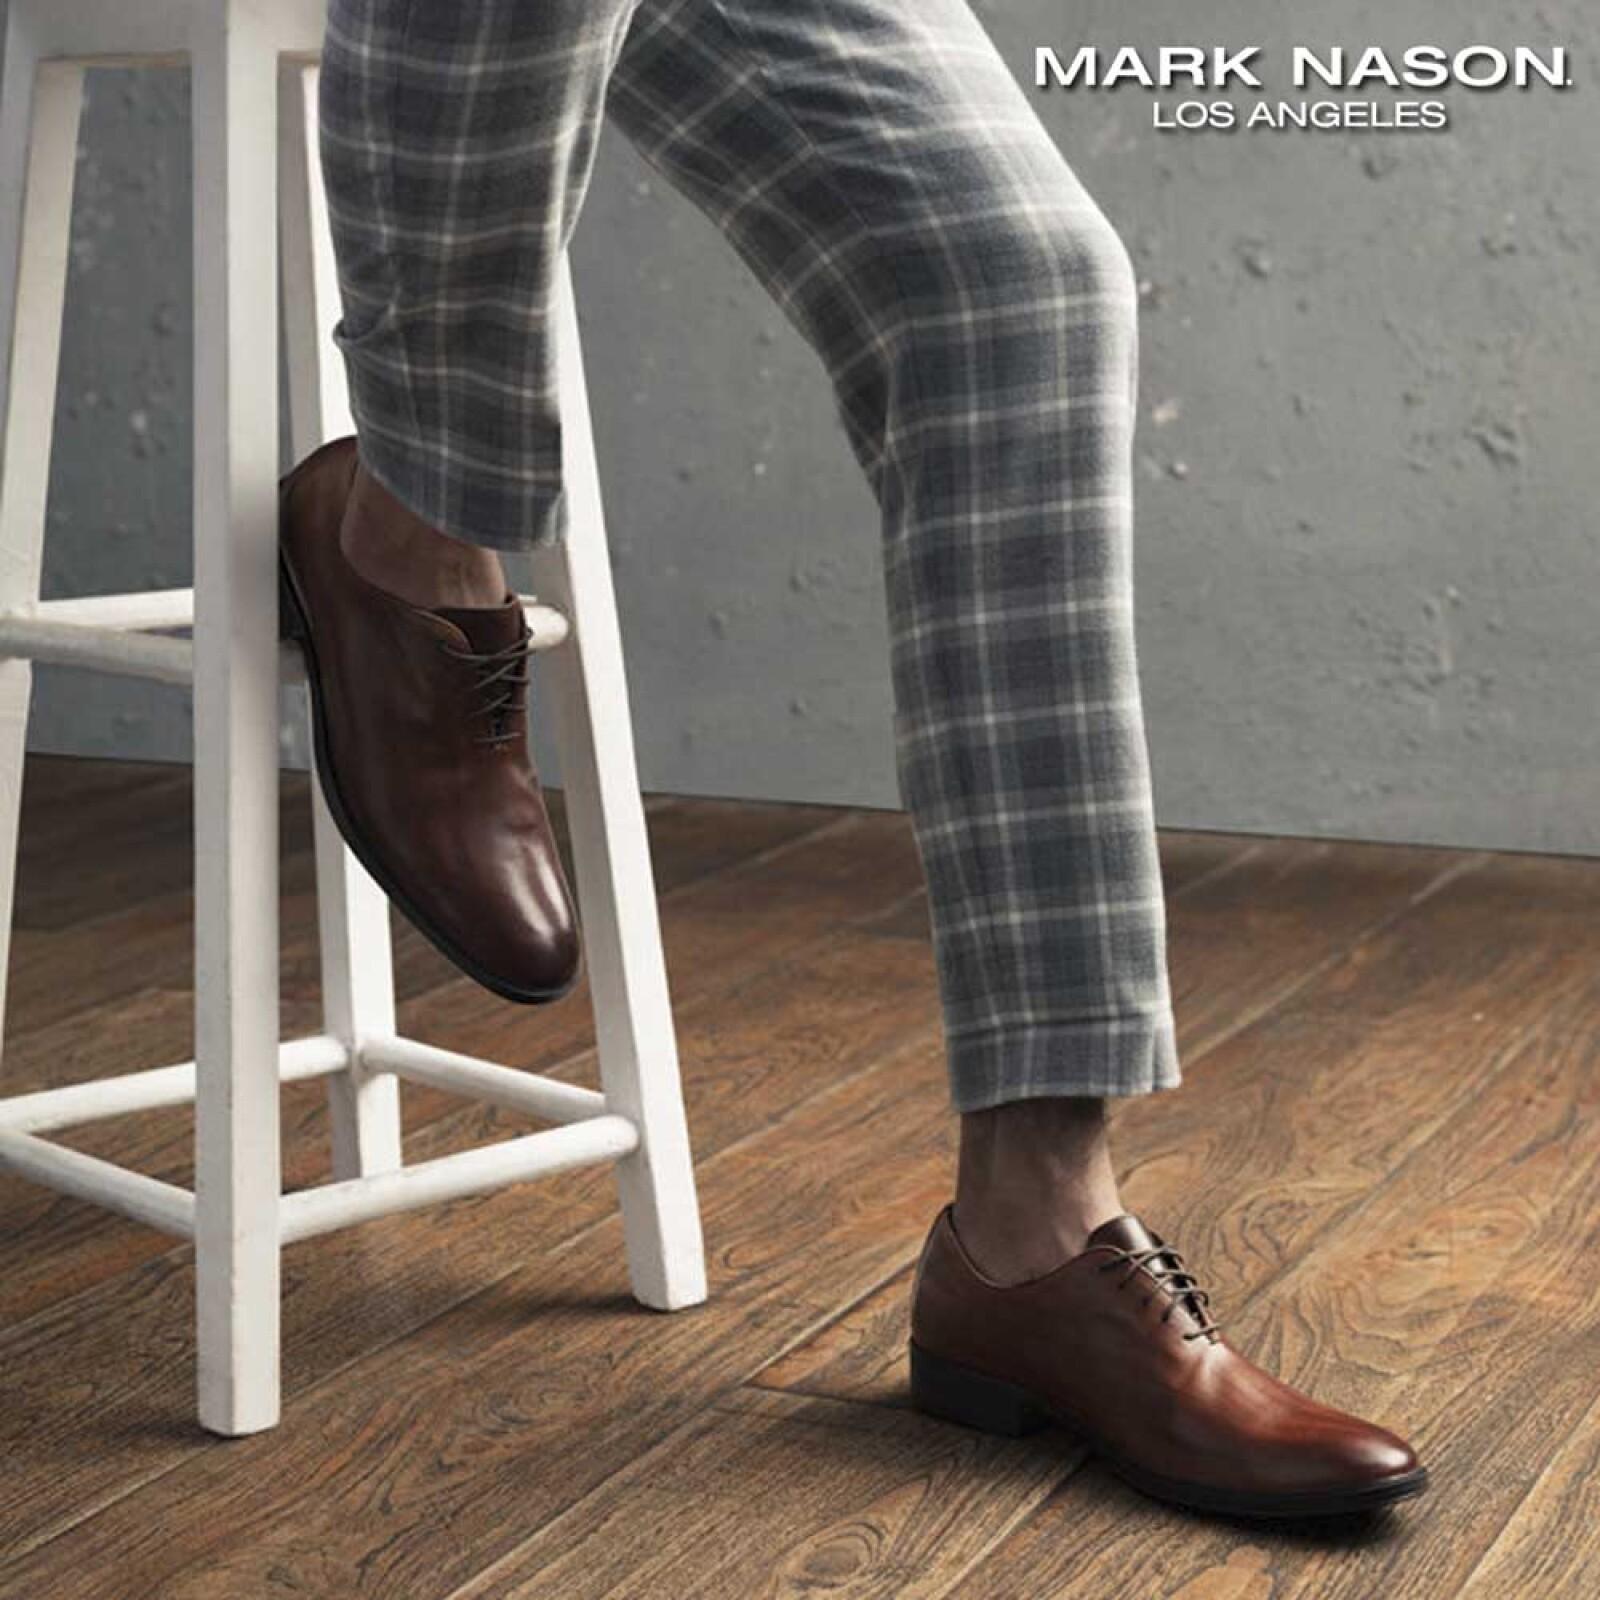 Mark Nason _5.jpg